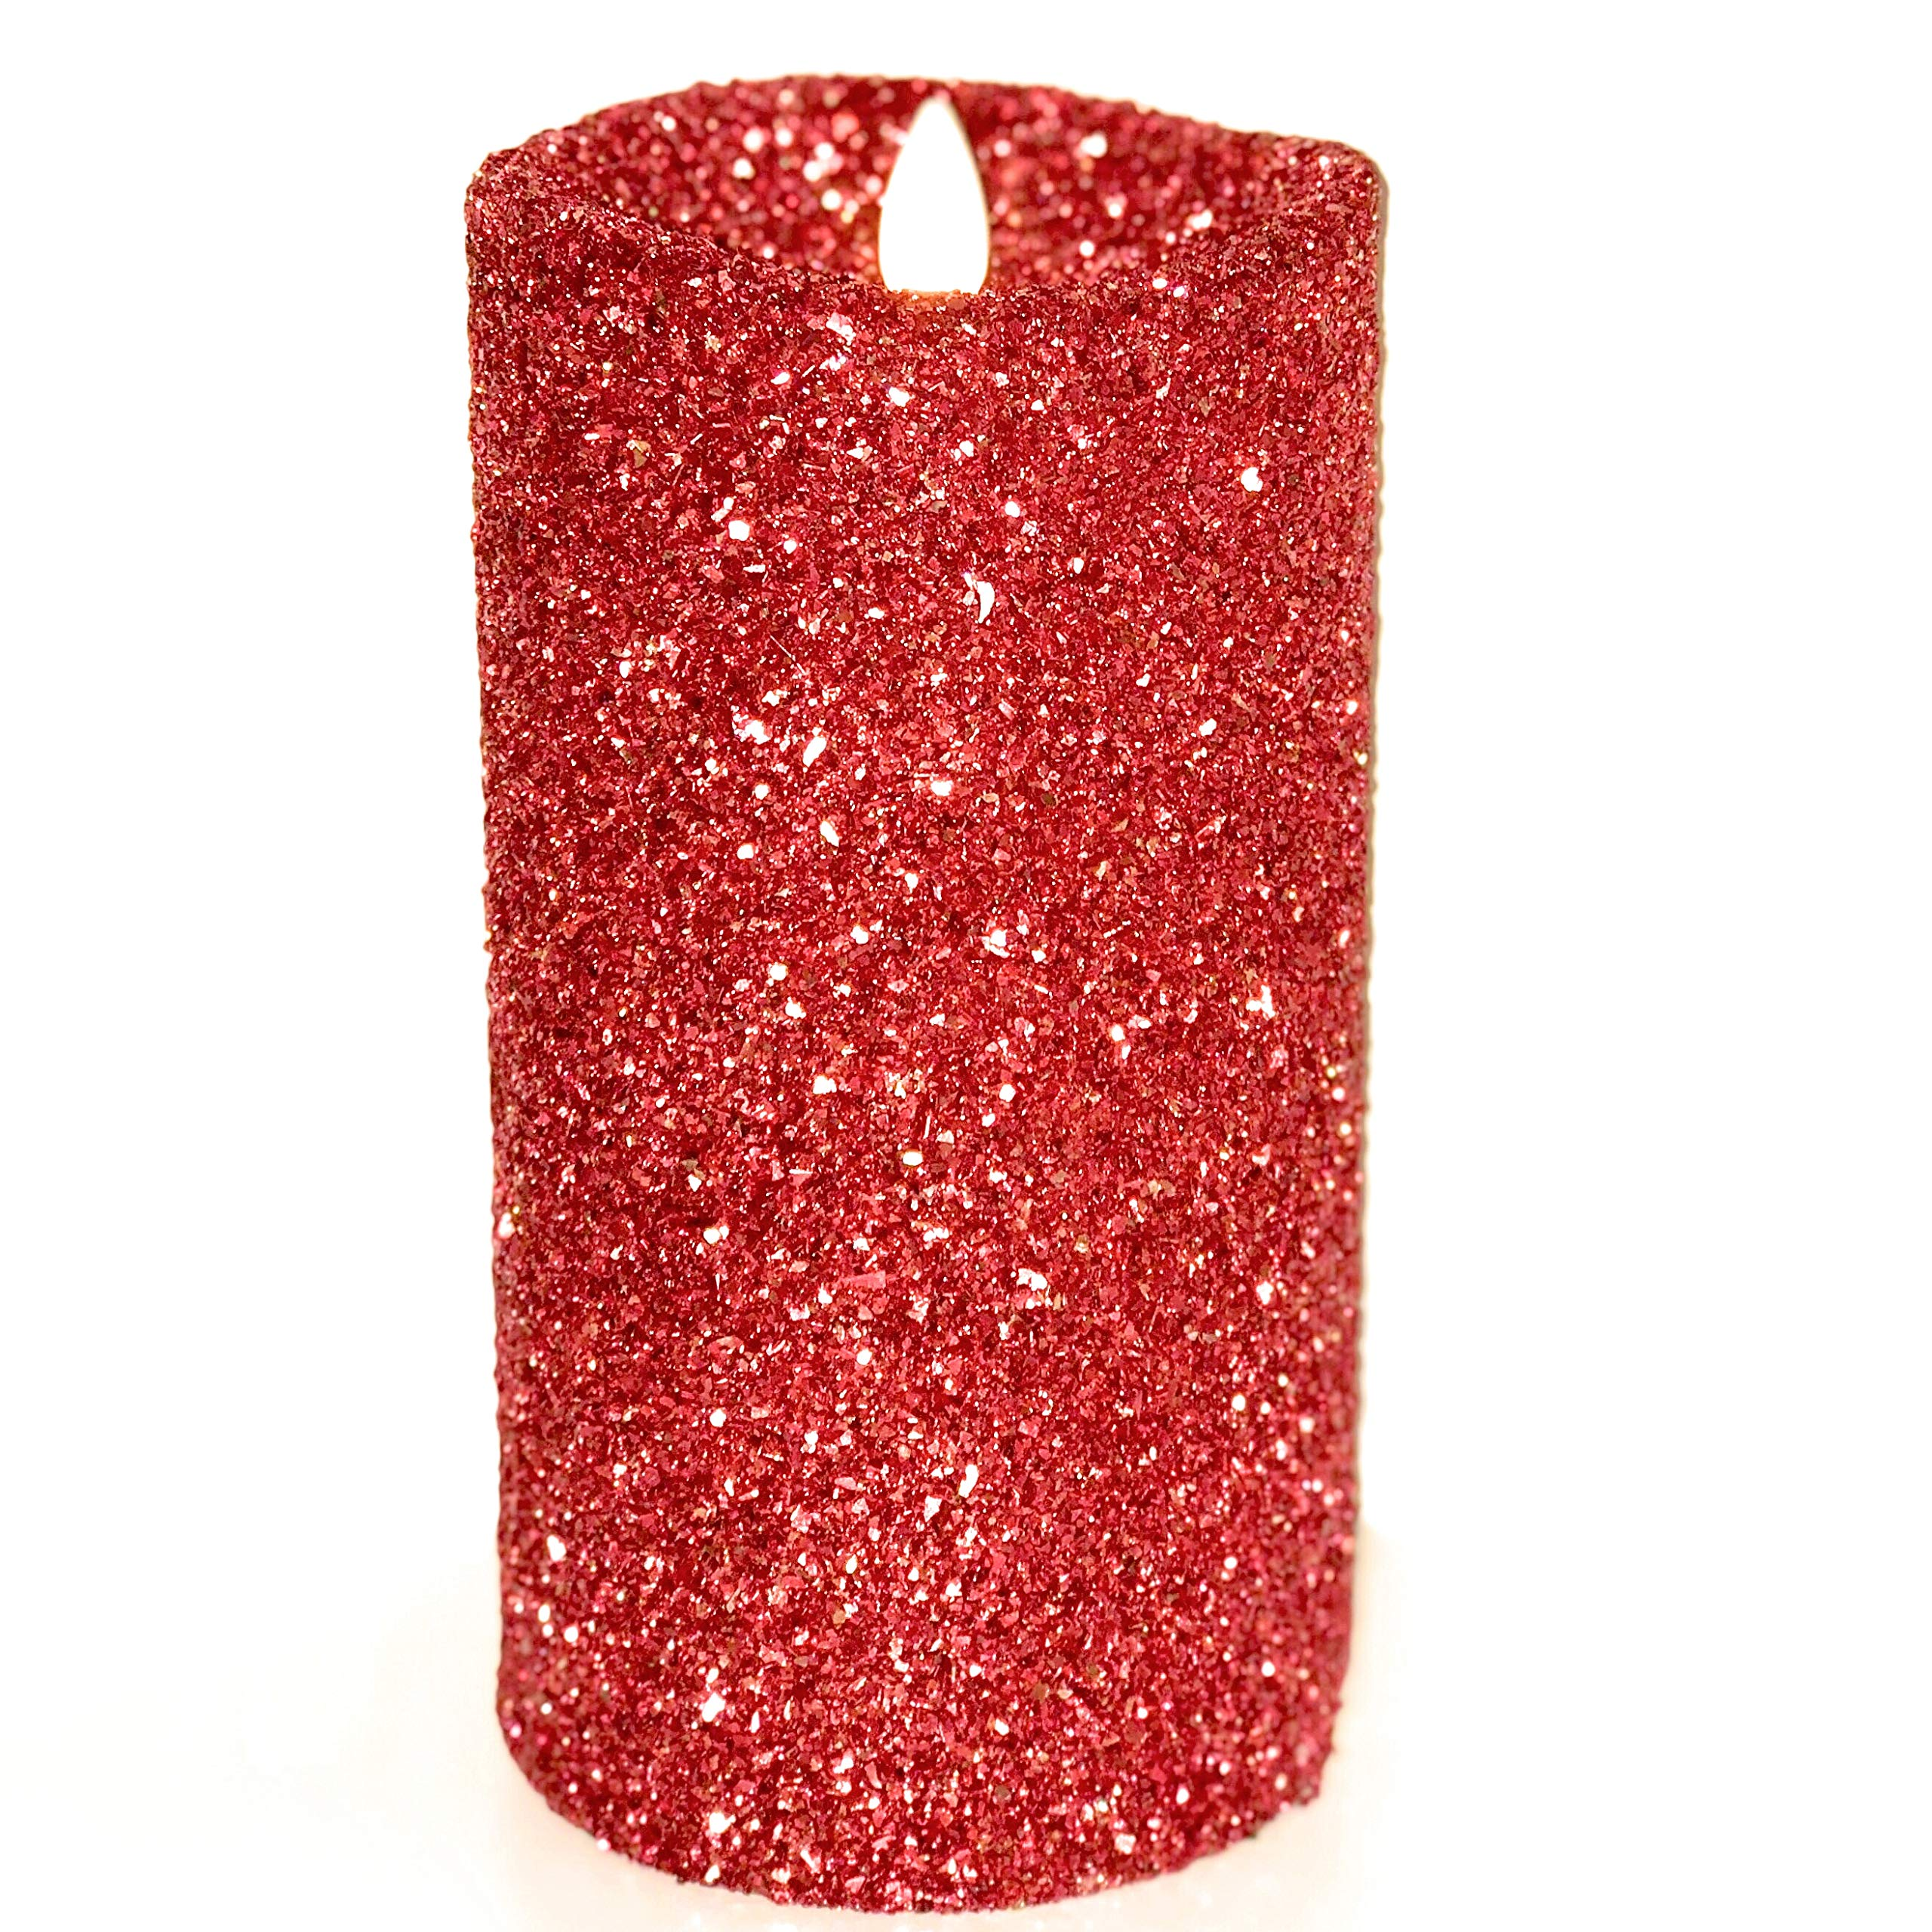 Luminara Vintage Red Glitter 5'' Flameless Pillar Candles w/Remote by Luminara